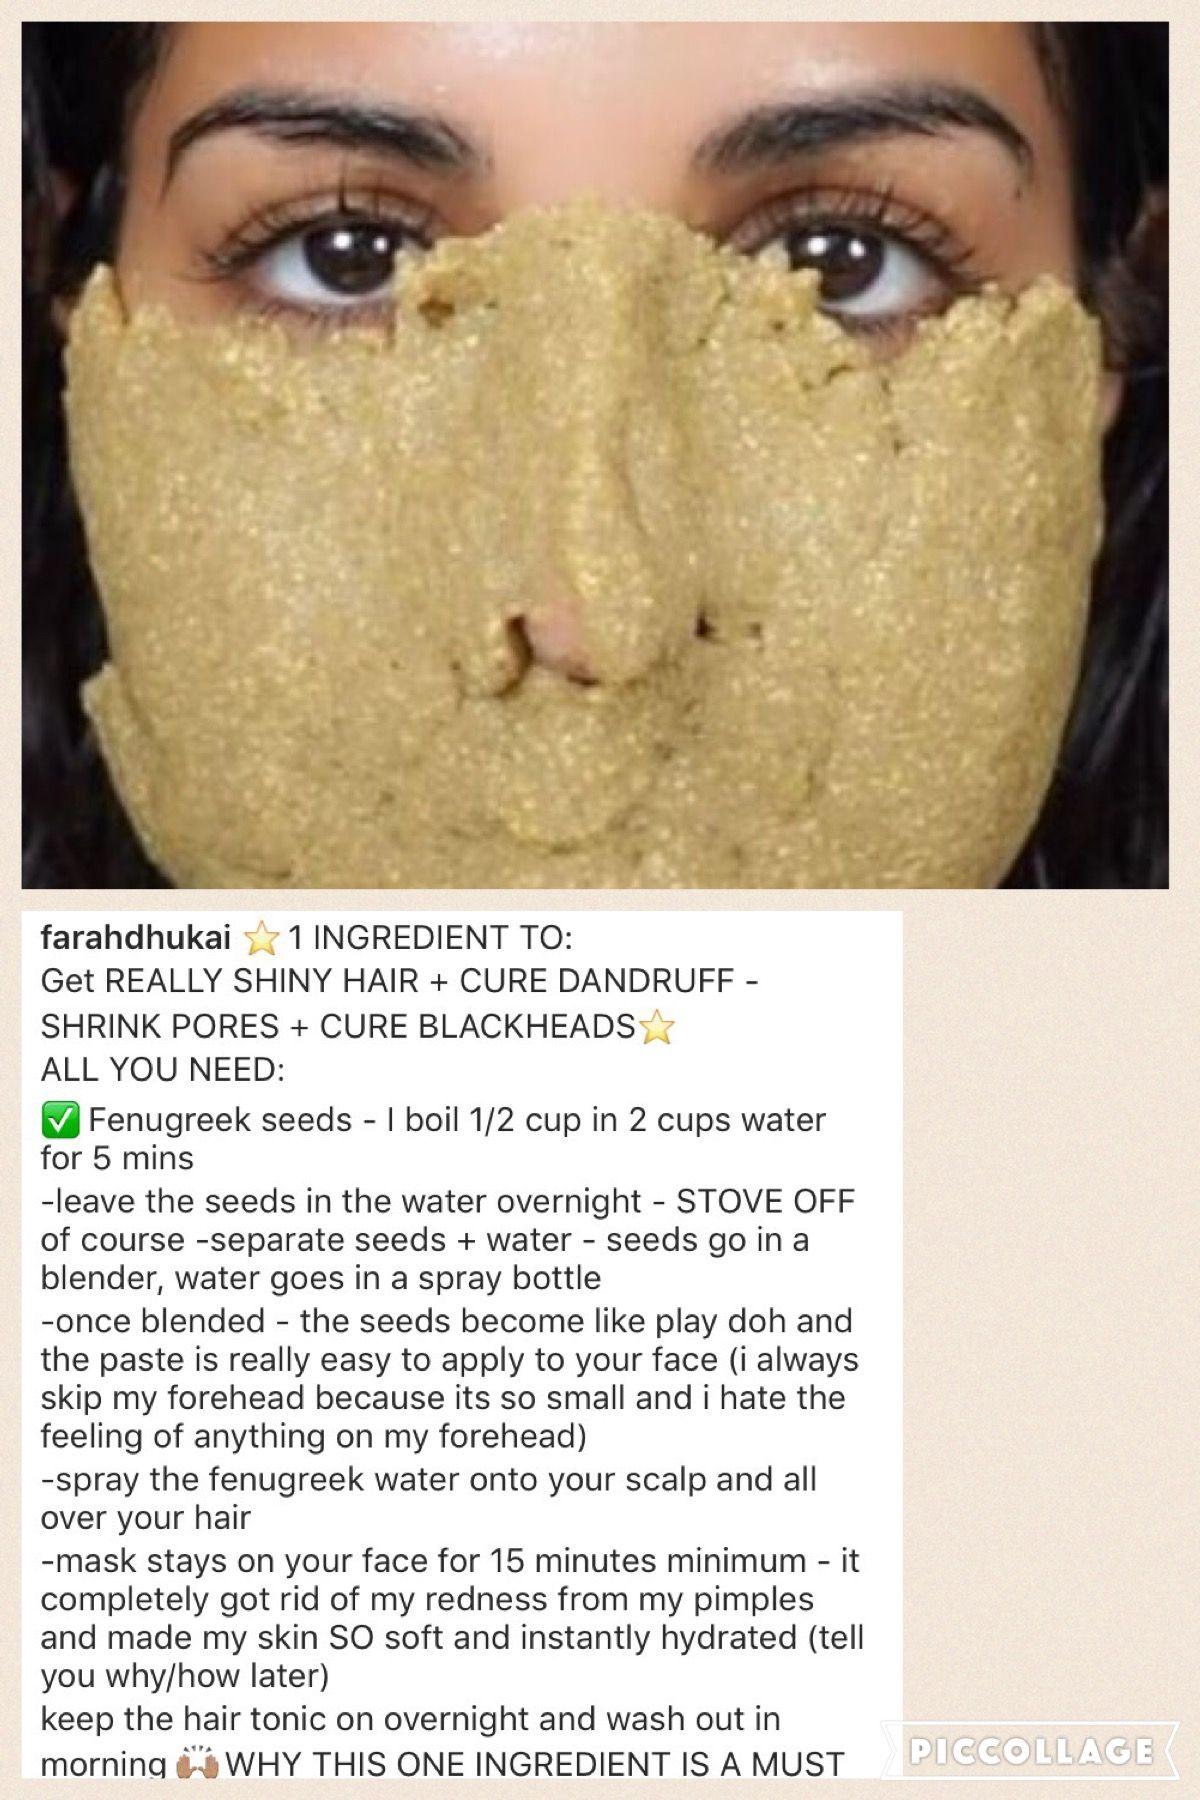 fenugreek uses for face